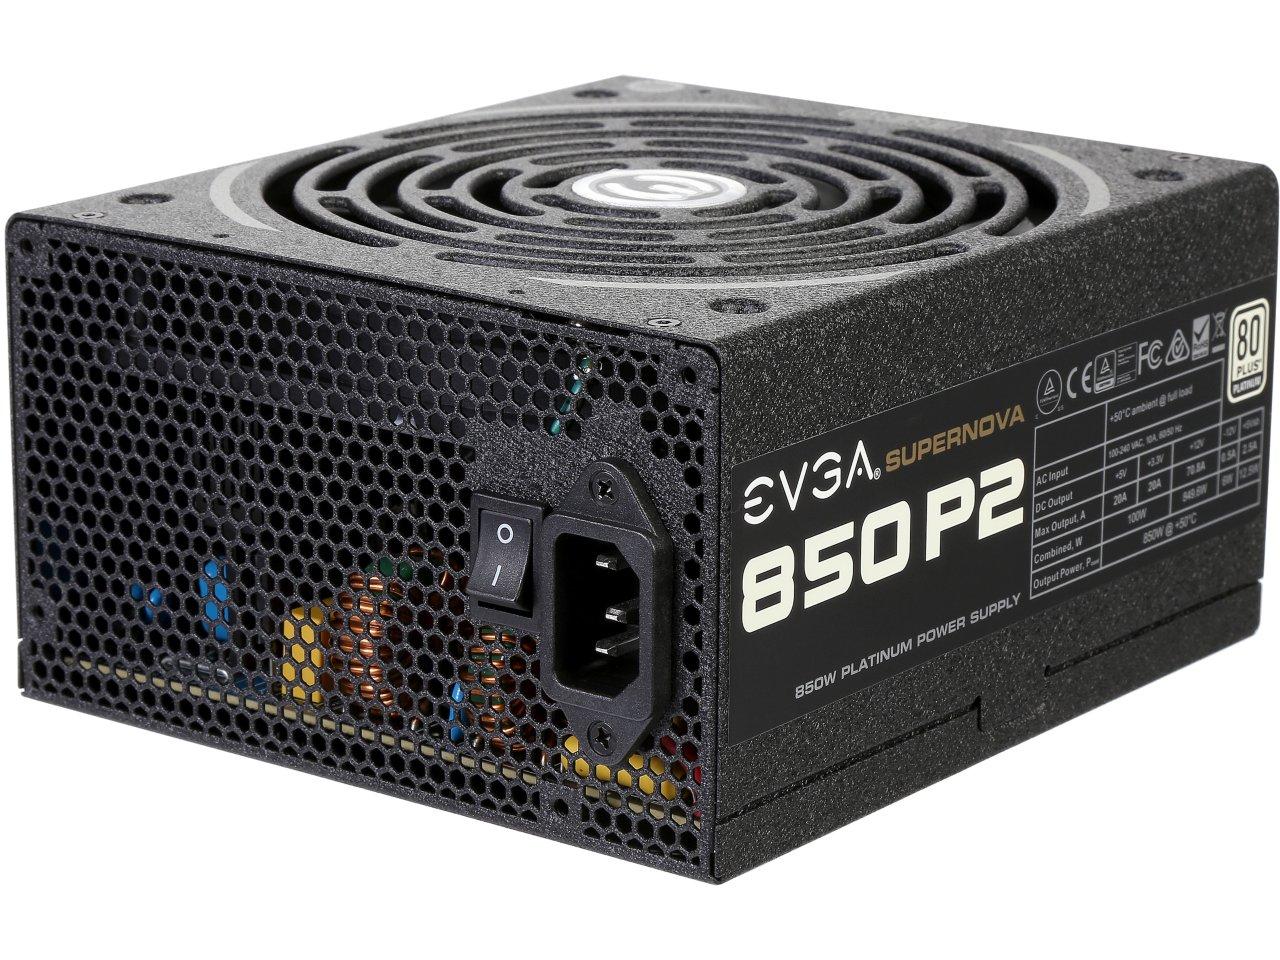 850 Watt EVGA SuperNOVA 850 P2 80 Plus Platinum Certified Full Modular Power Supply for $109.99 AR + Free Shipping @ Newegg.com